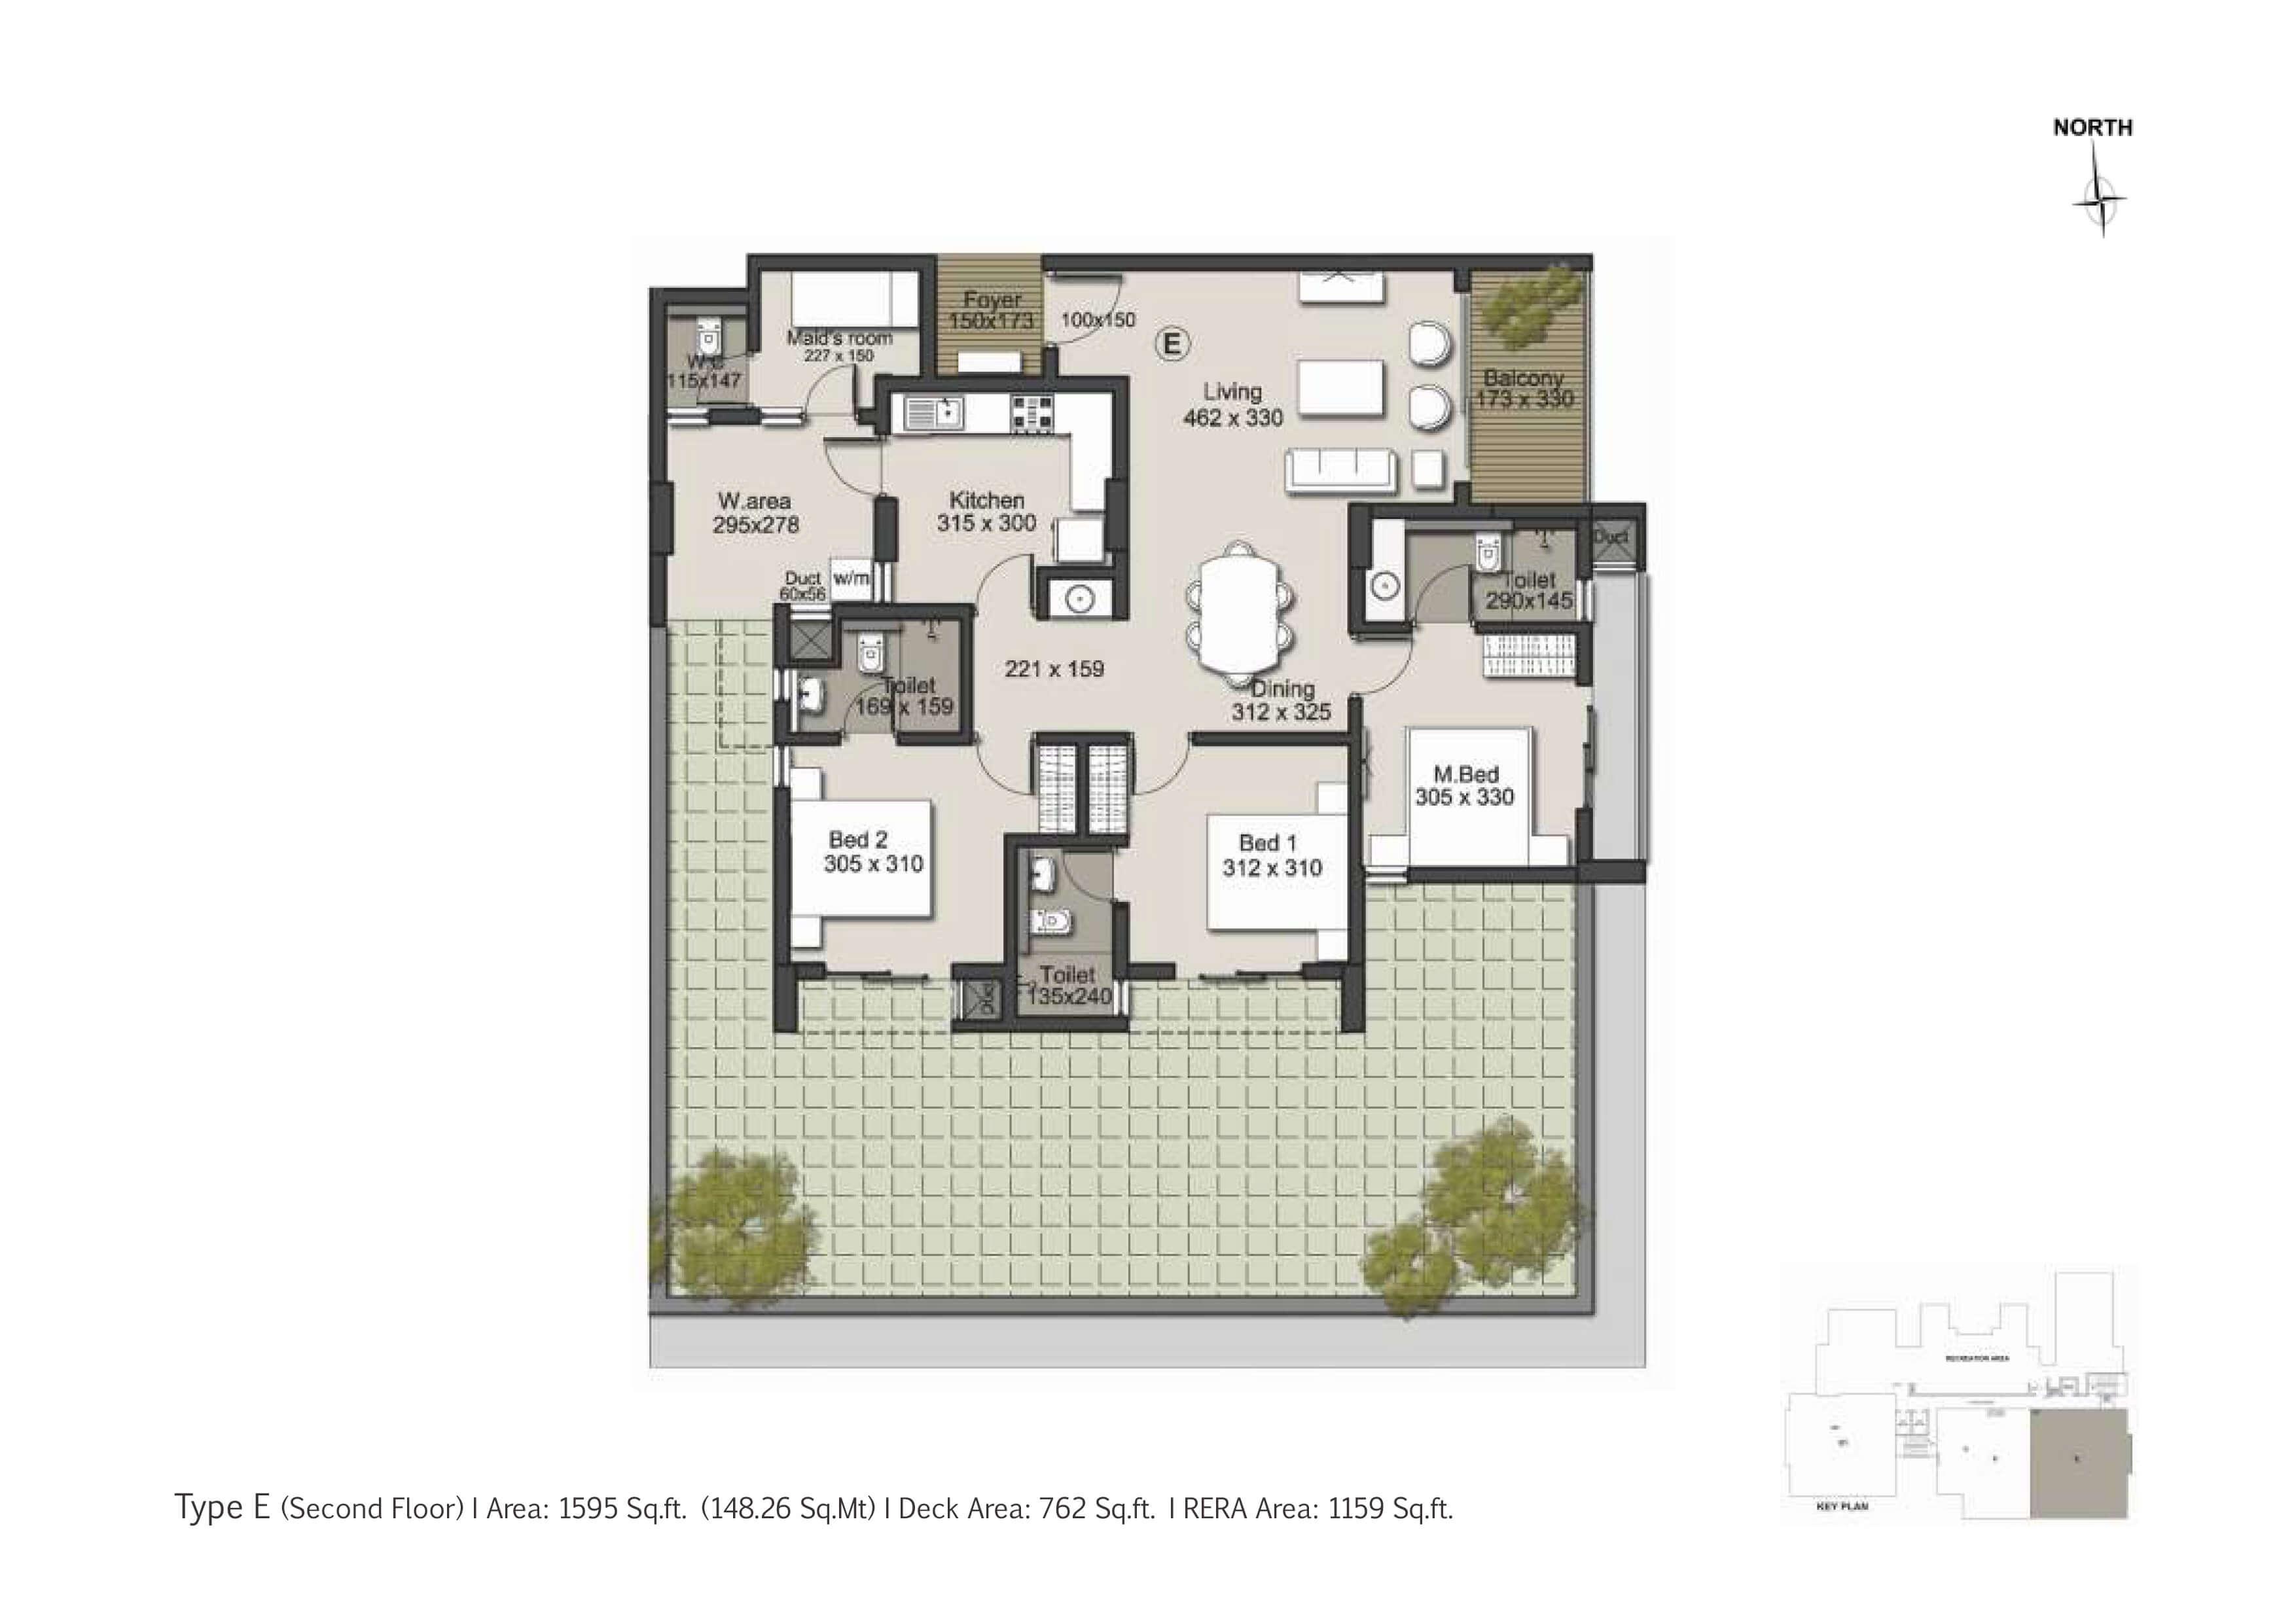 Type E Second Floor Plan